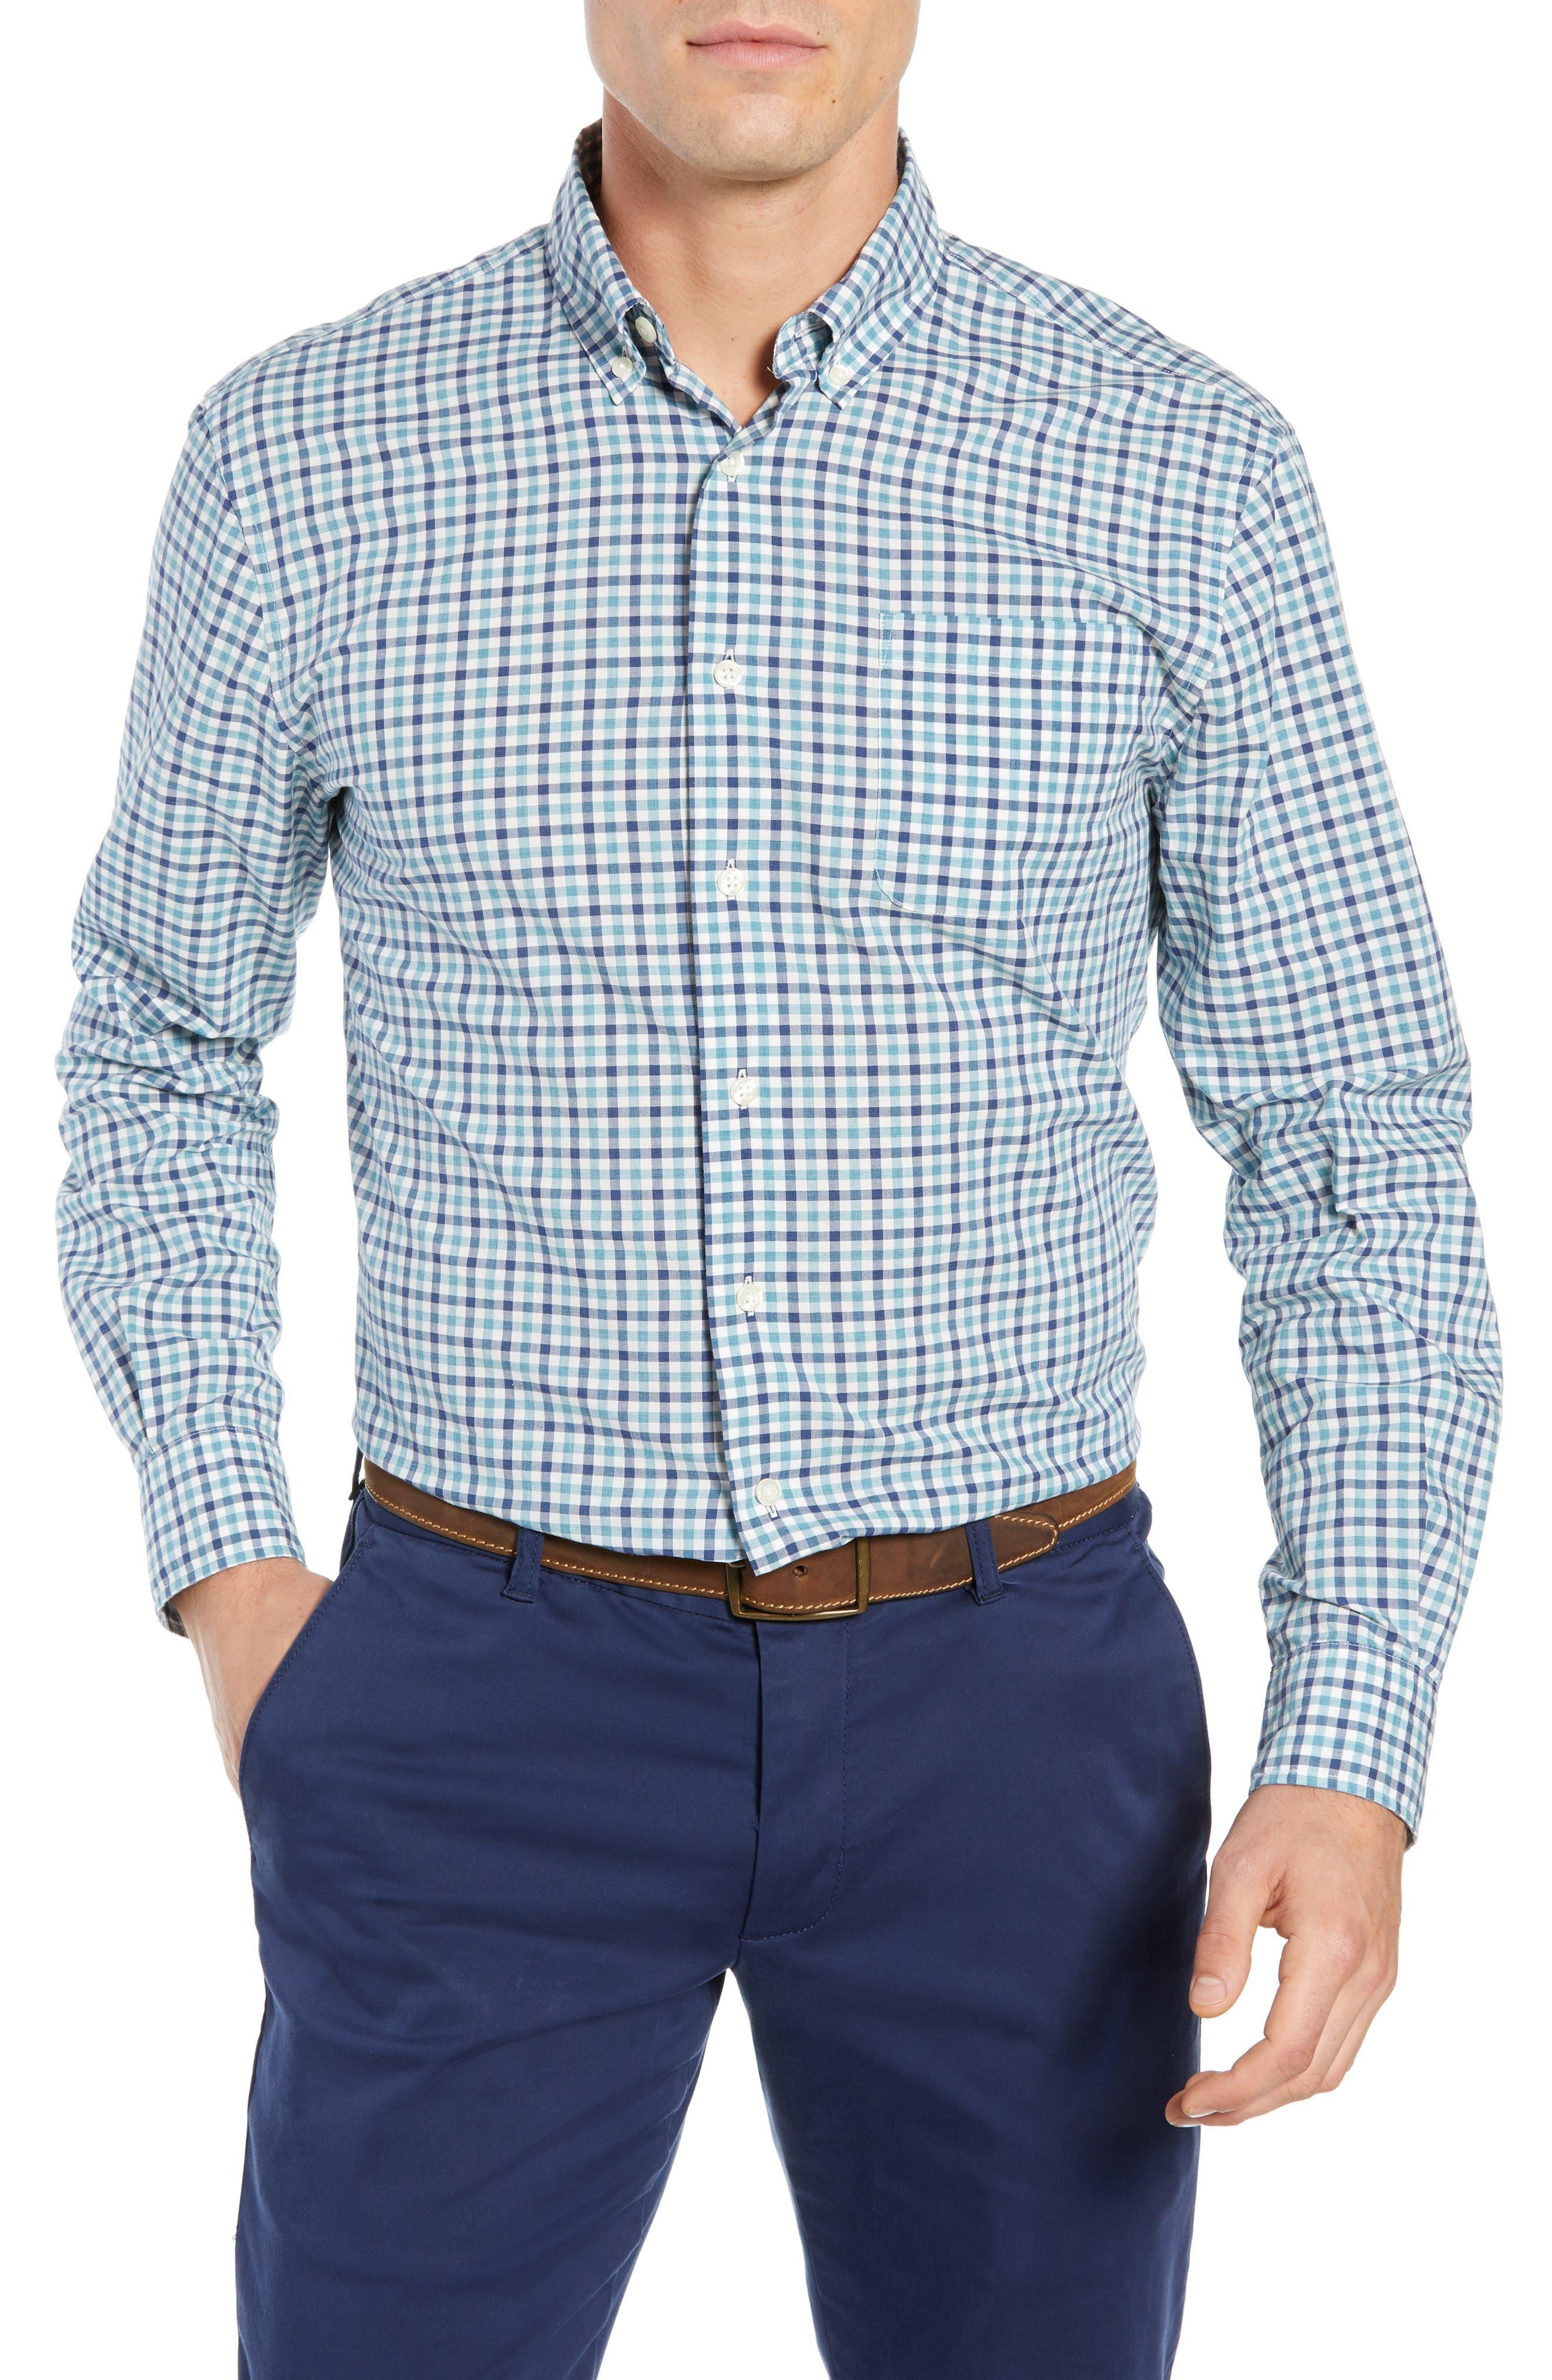 Finley Classic Fit Sport Shirt,                             Main thumbnail 1, color,                             JADE